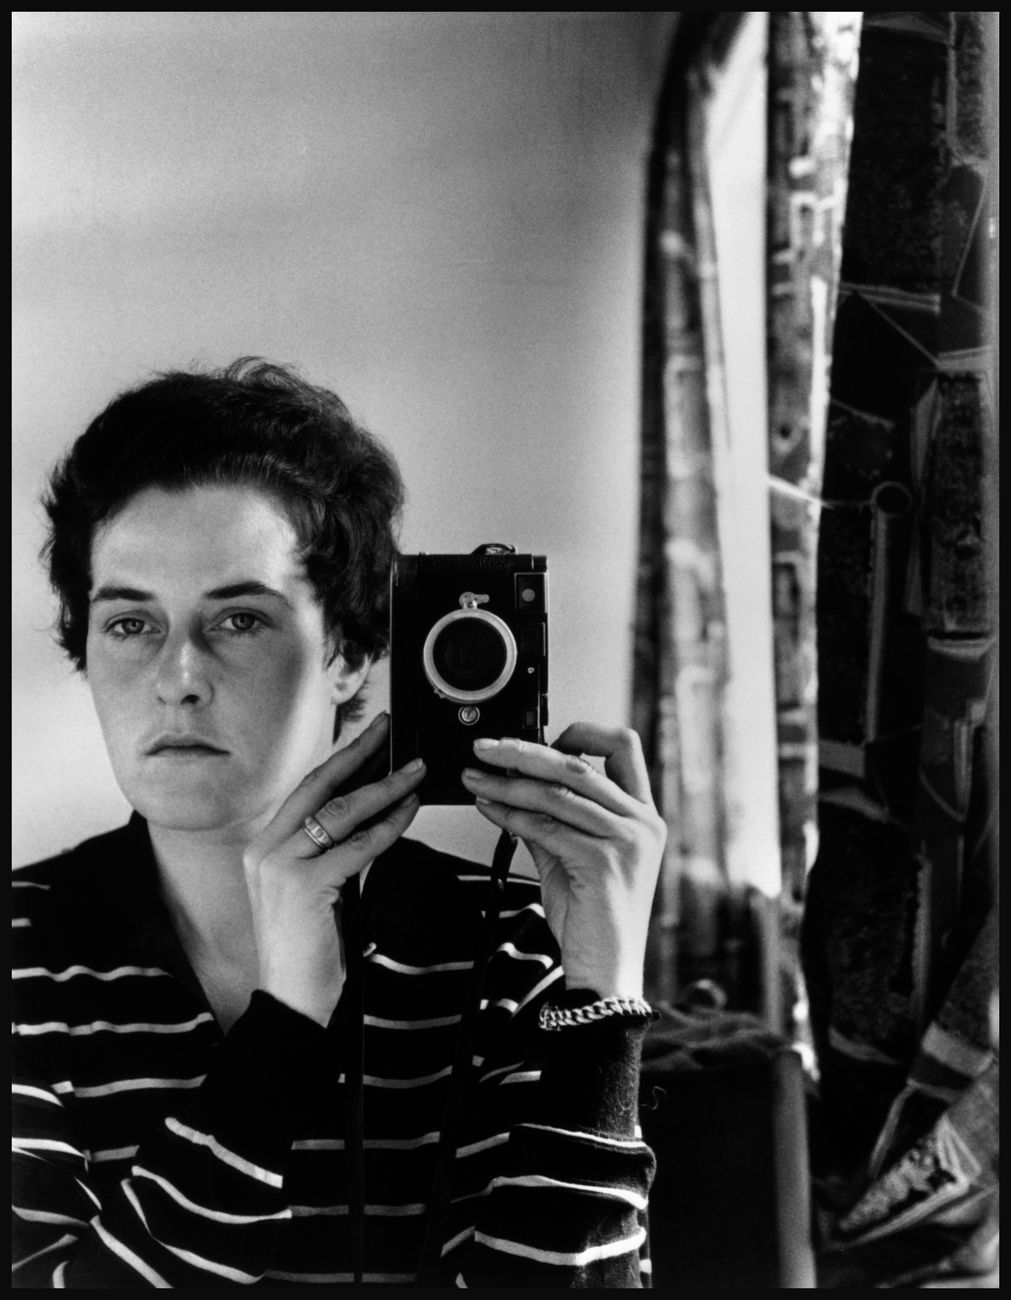 Inge Morath, Autoscatto, Gerusalemme, 1958 © Fotohof archiv - Inge Morath - Magnum Photos